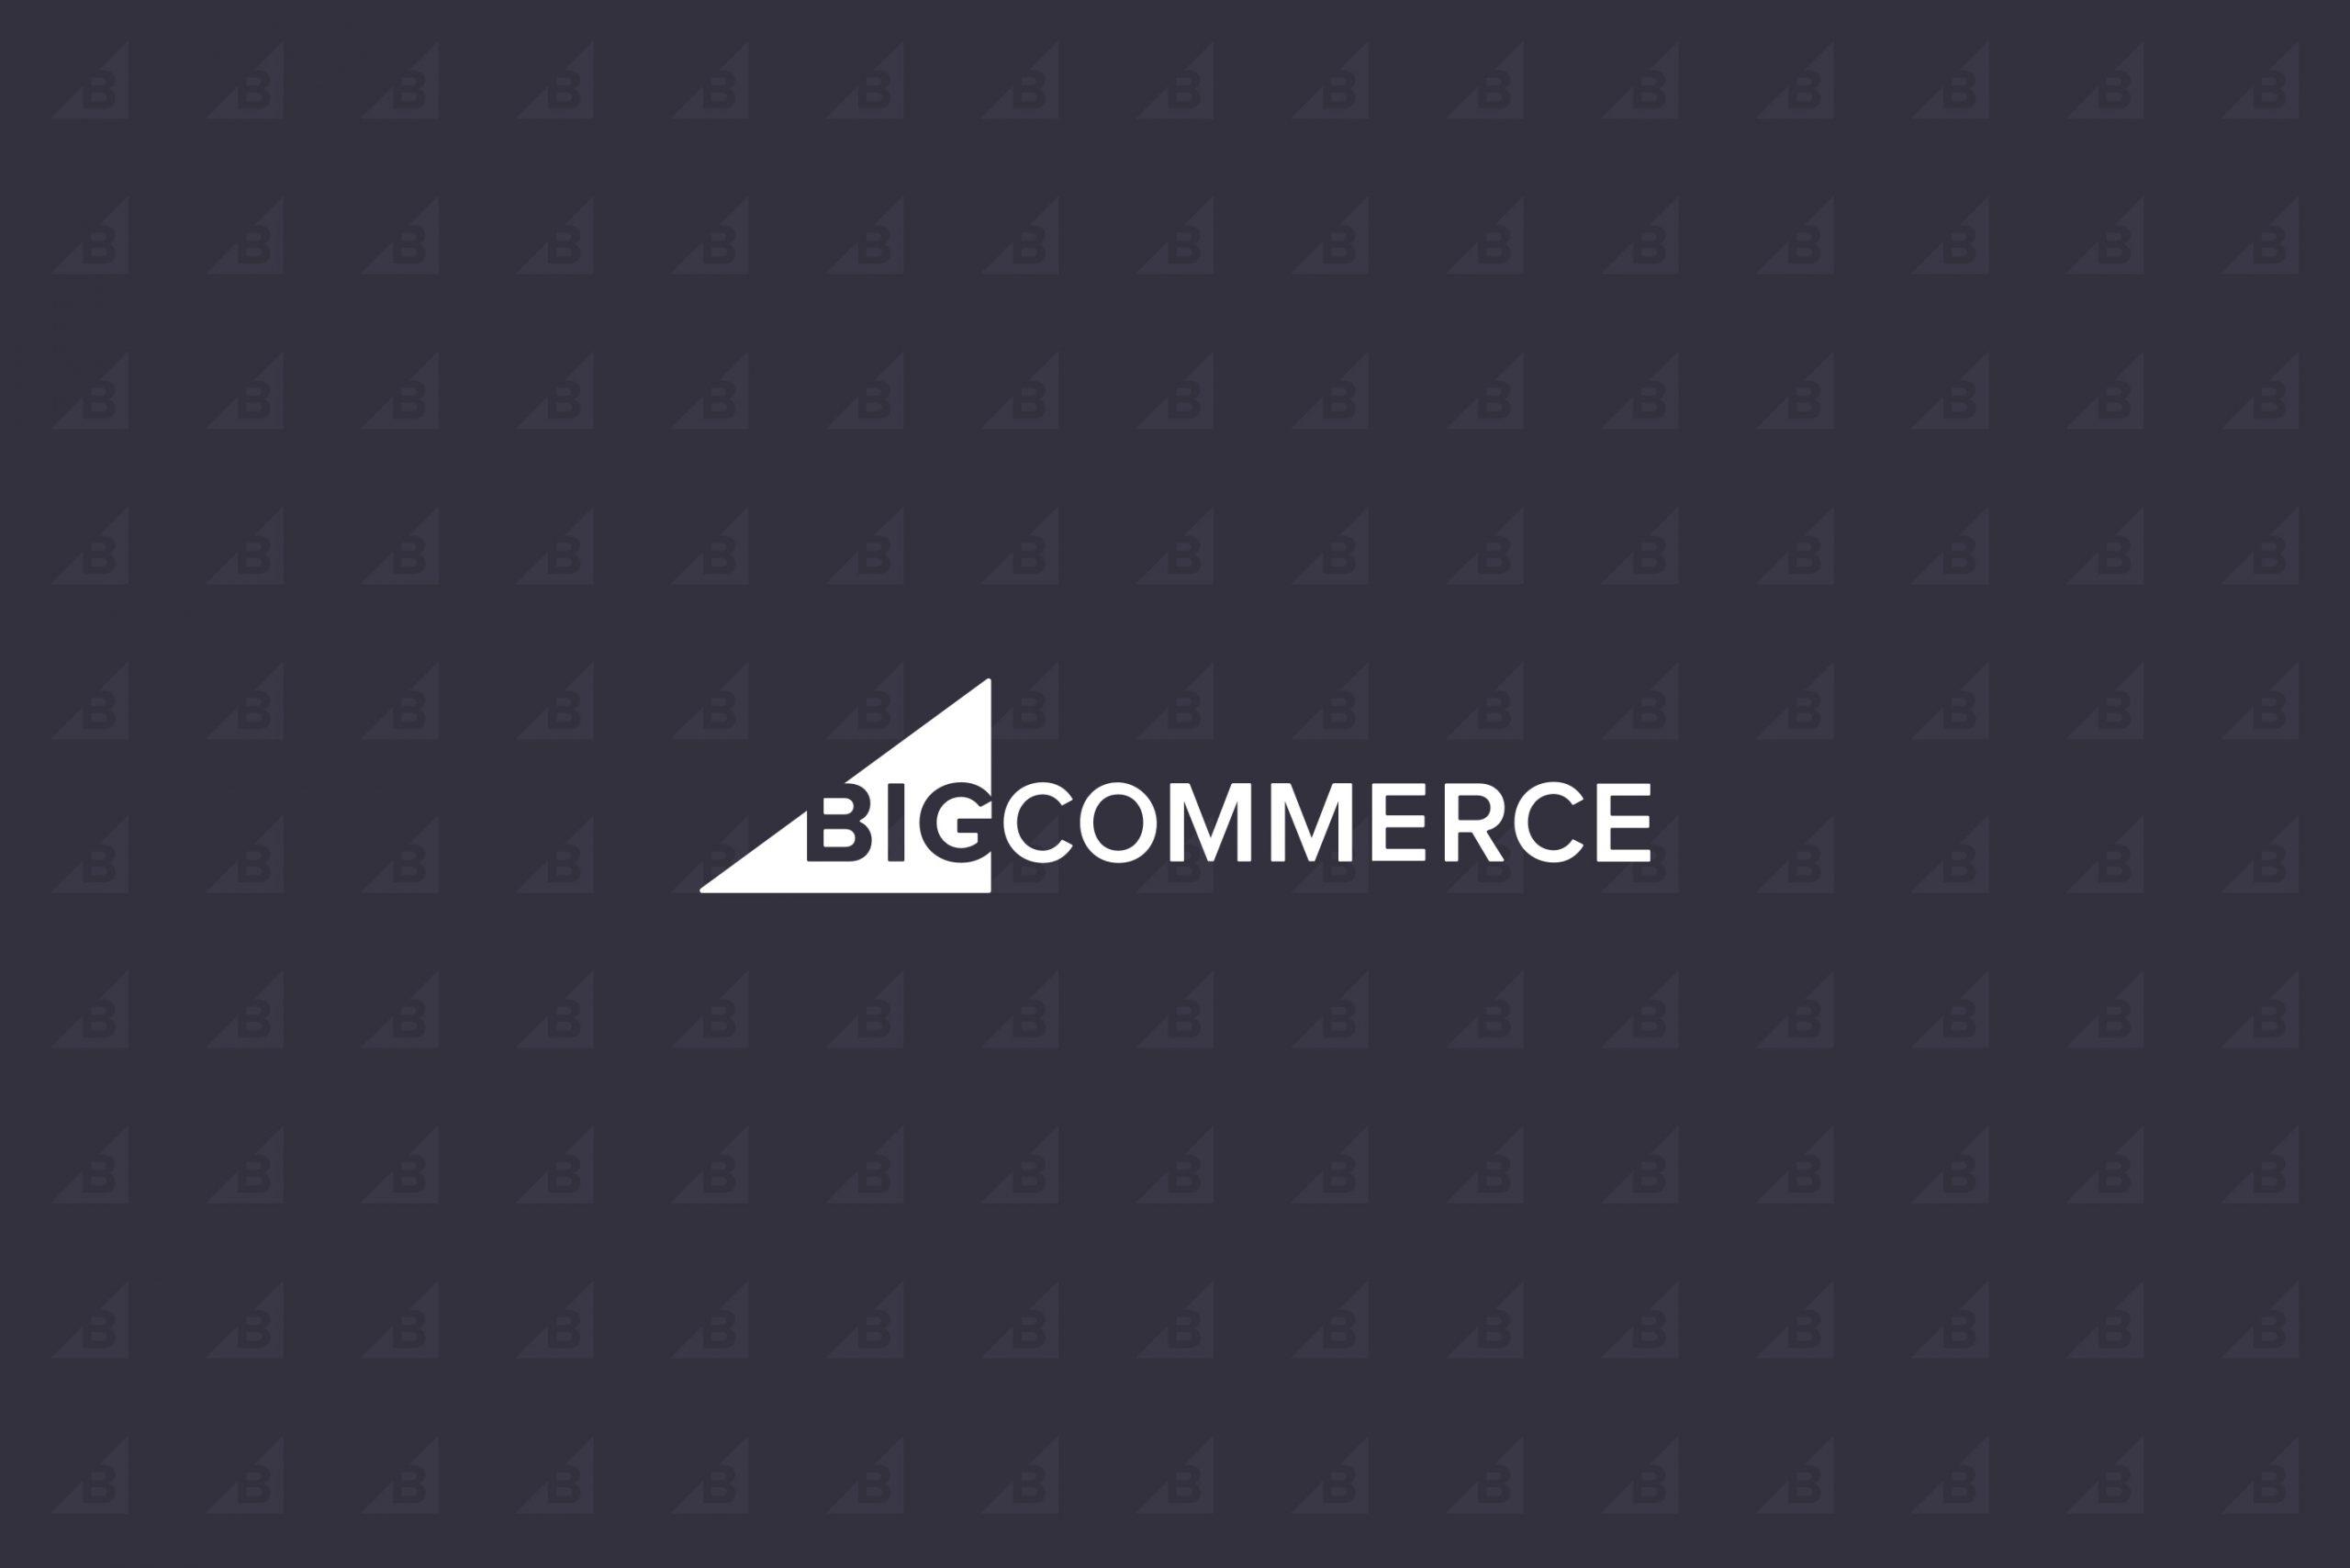 Next Level Ecommerce from Digital Six and BigCommerce